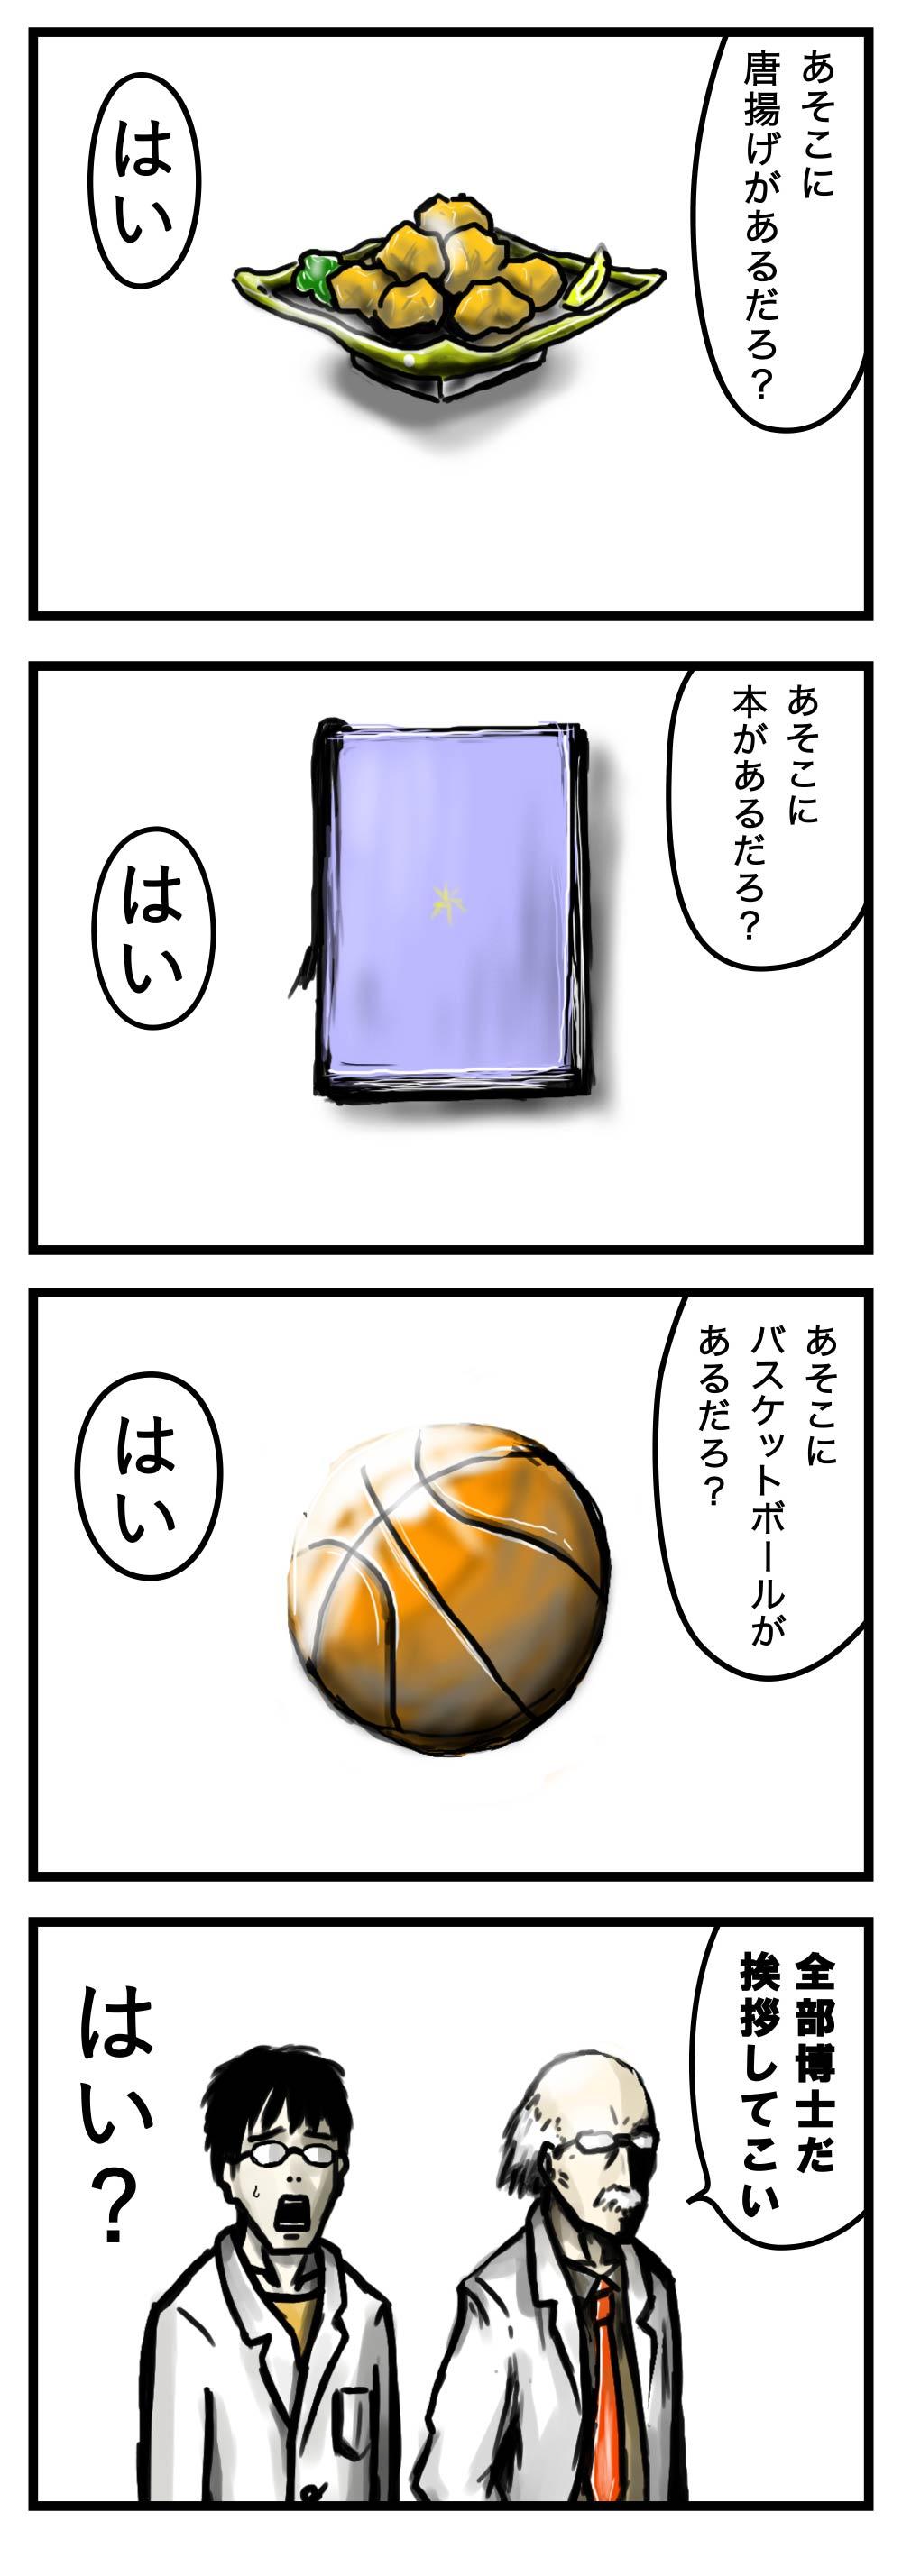 日本支部職員_4コマ.jpg